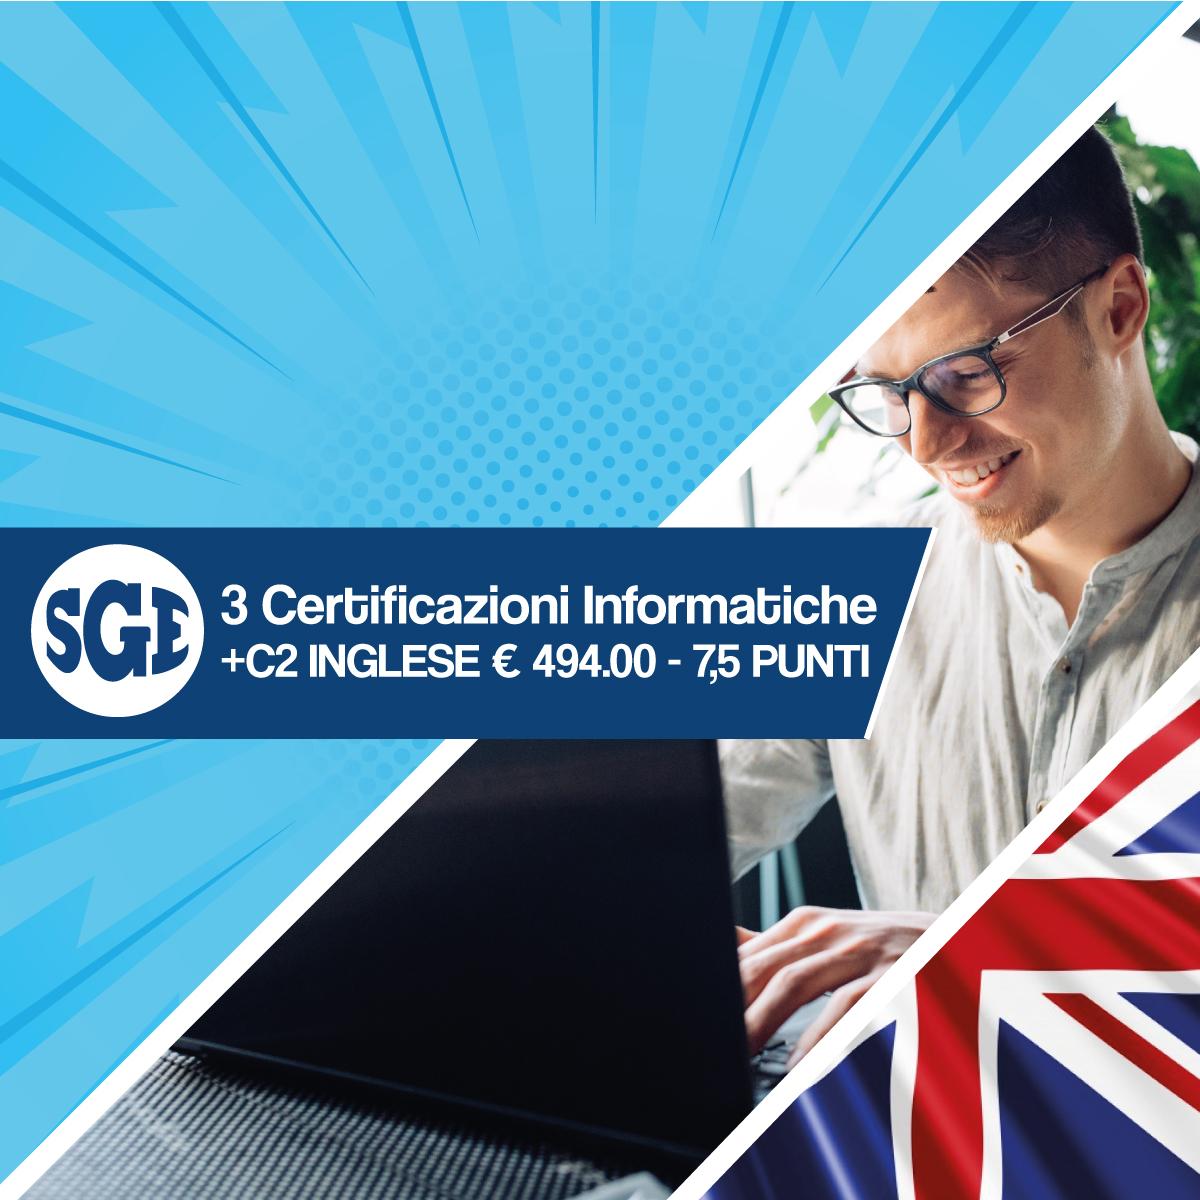 4 Certificazioni Informatiche € 494.00 - 7,5 PUNTI